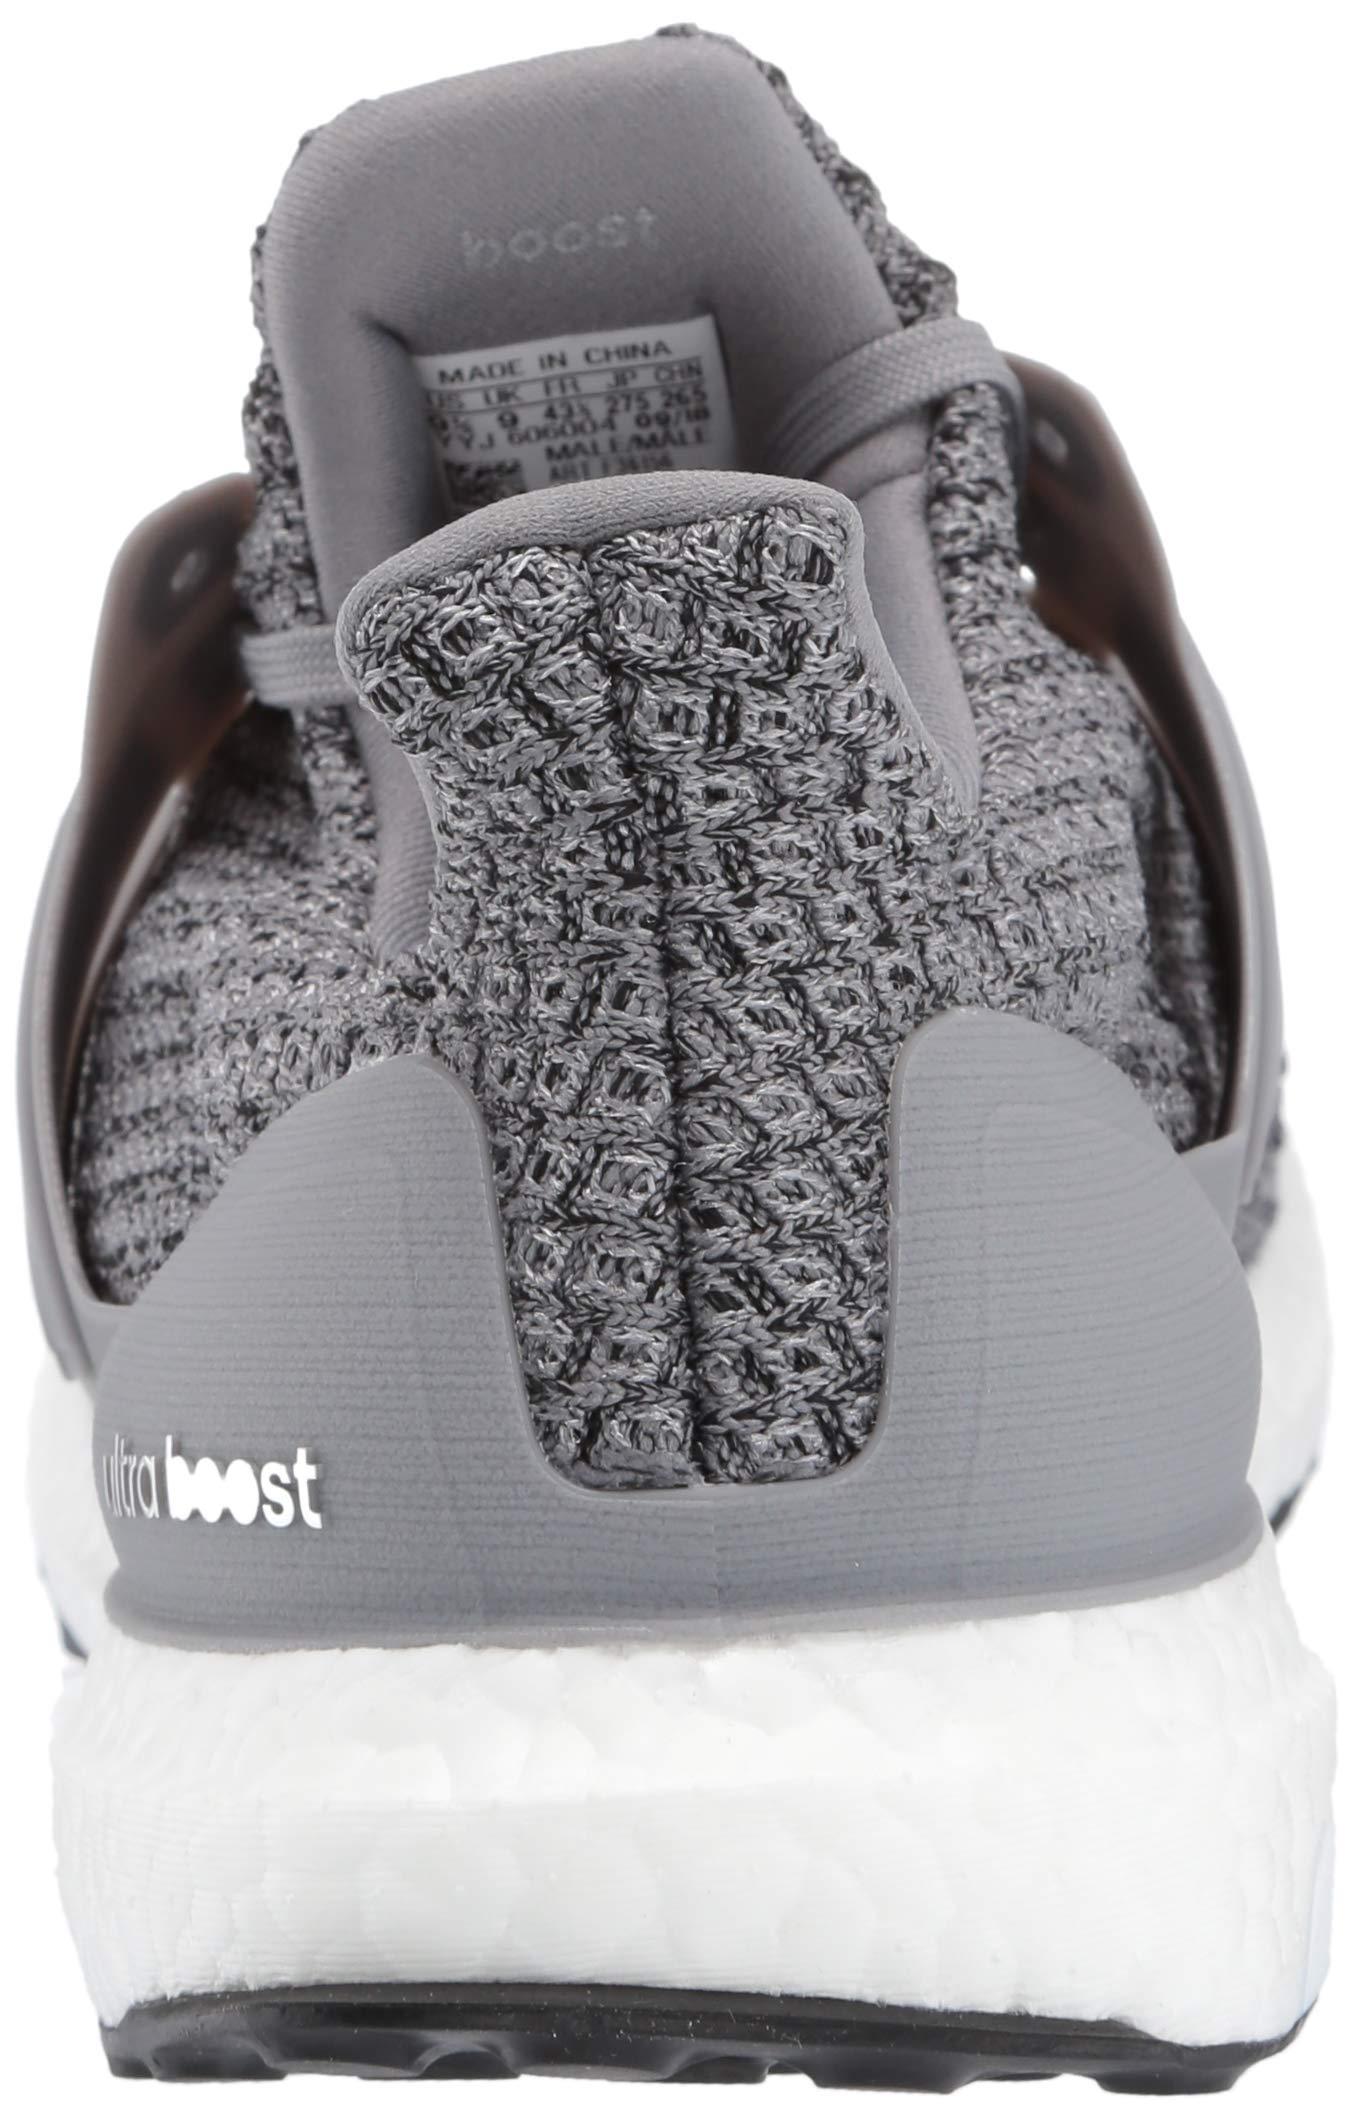 adidas Men's Ultraboost, Grey/Black, 4 M US by adidas (Image #2)